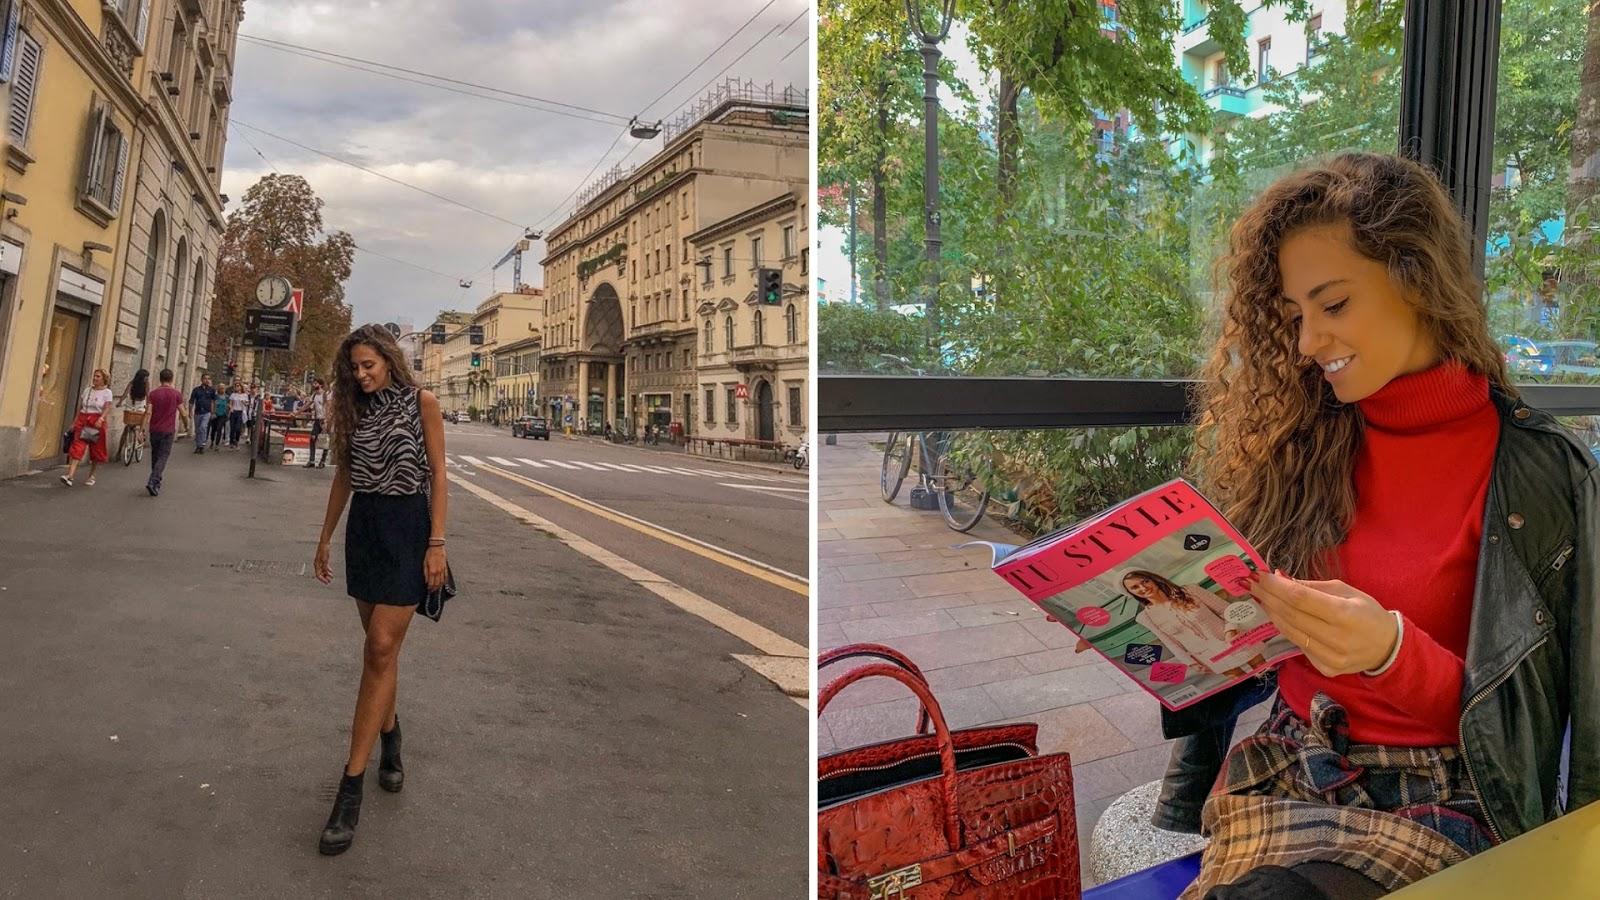 i trend autunno inverno 2018 animali e tartan, animalier trend, tartan trend, fashion need, fashion blog italia, Italian fashion blog, Valentina Rago, fashion blog milano